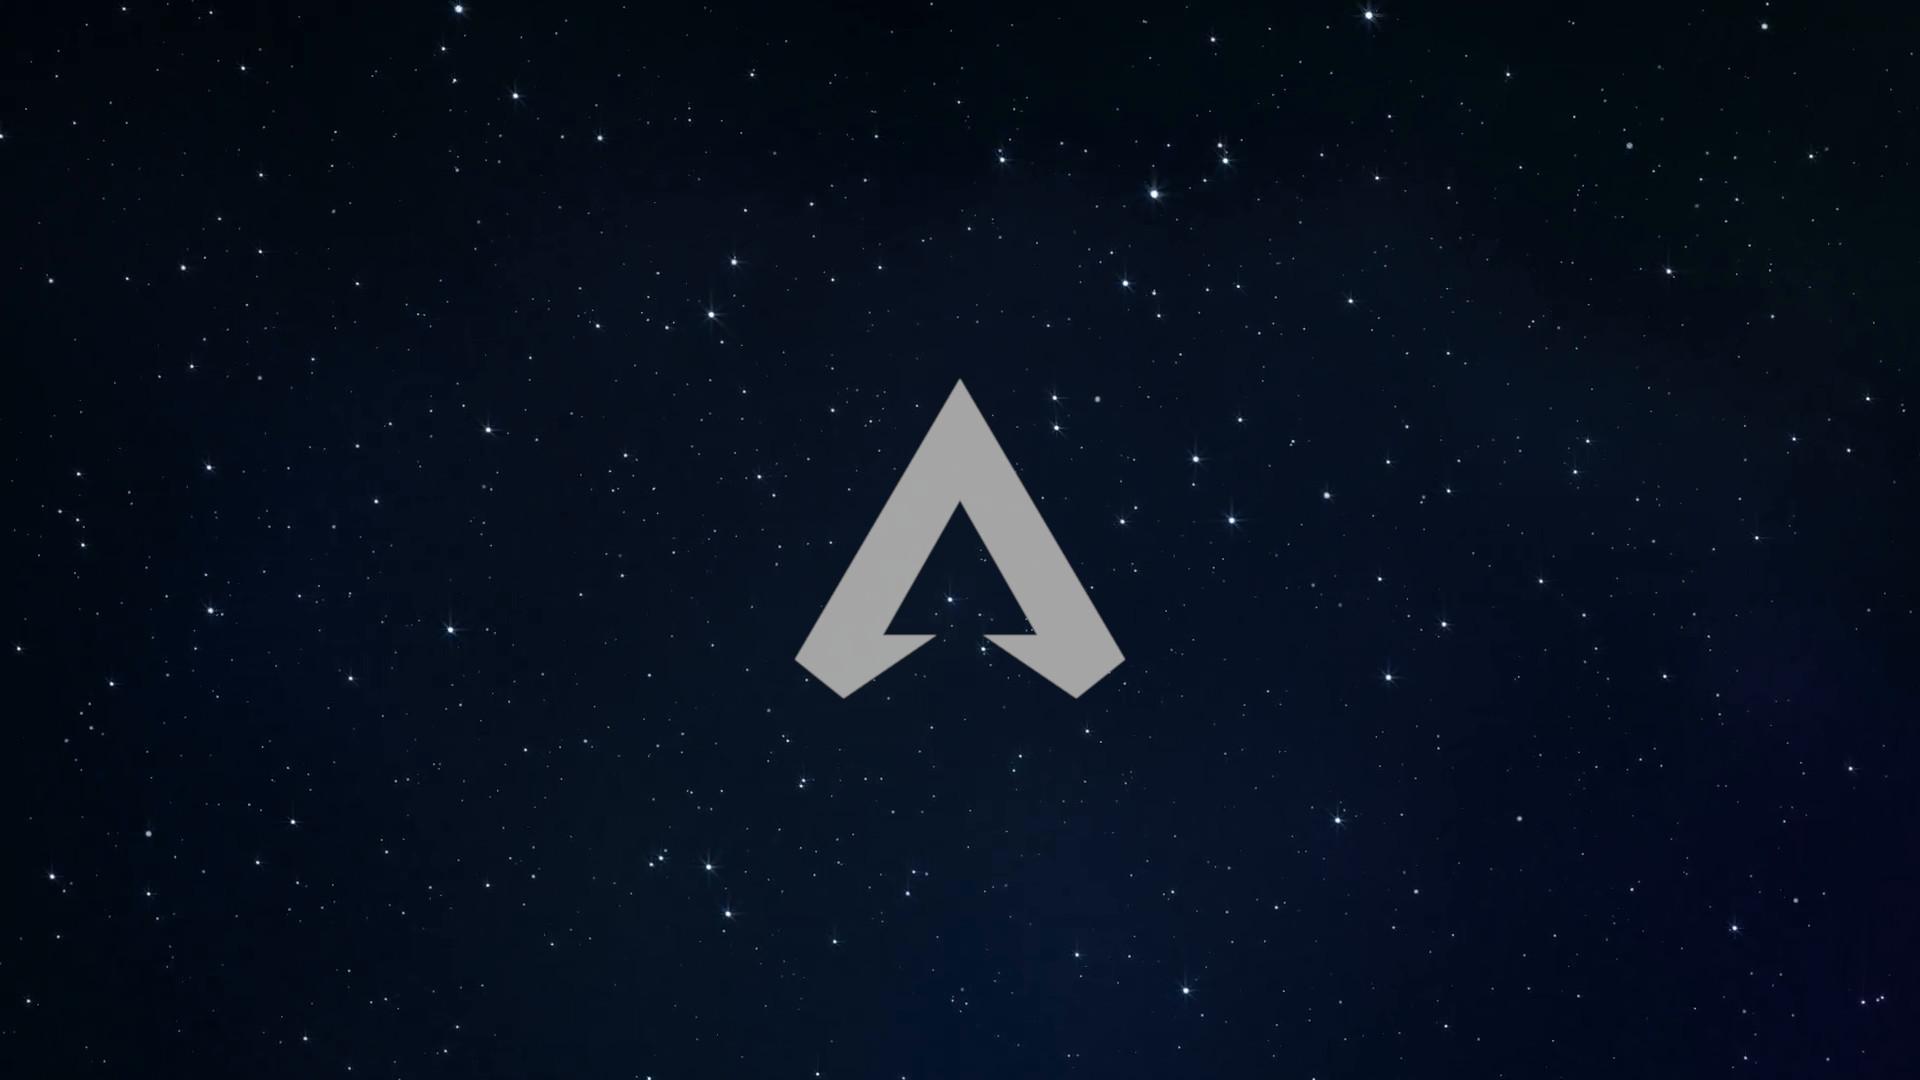 Apex Legends Logo Wallpaper 67151 1920x1080px